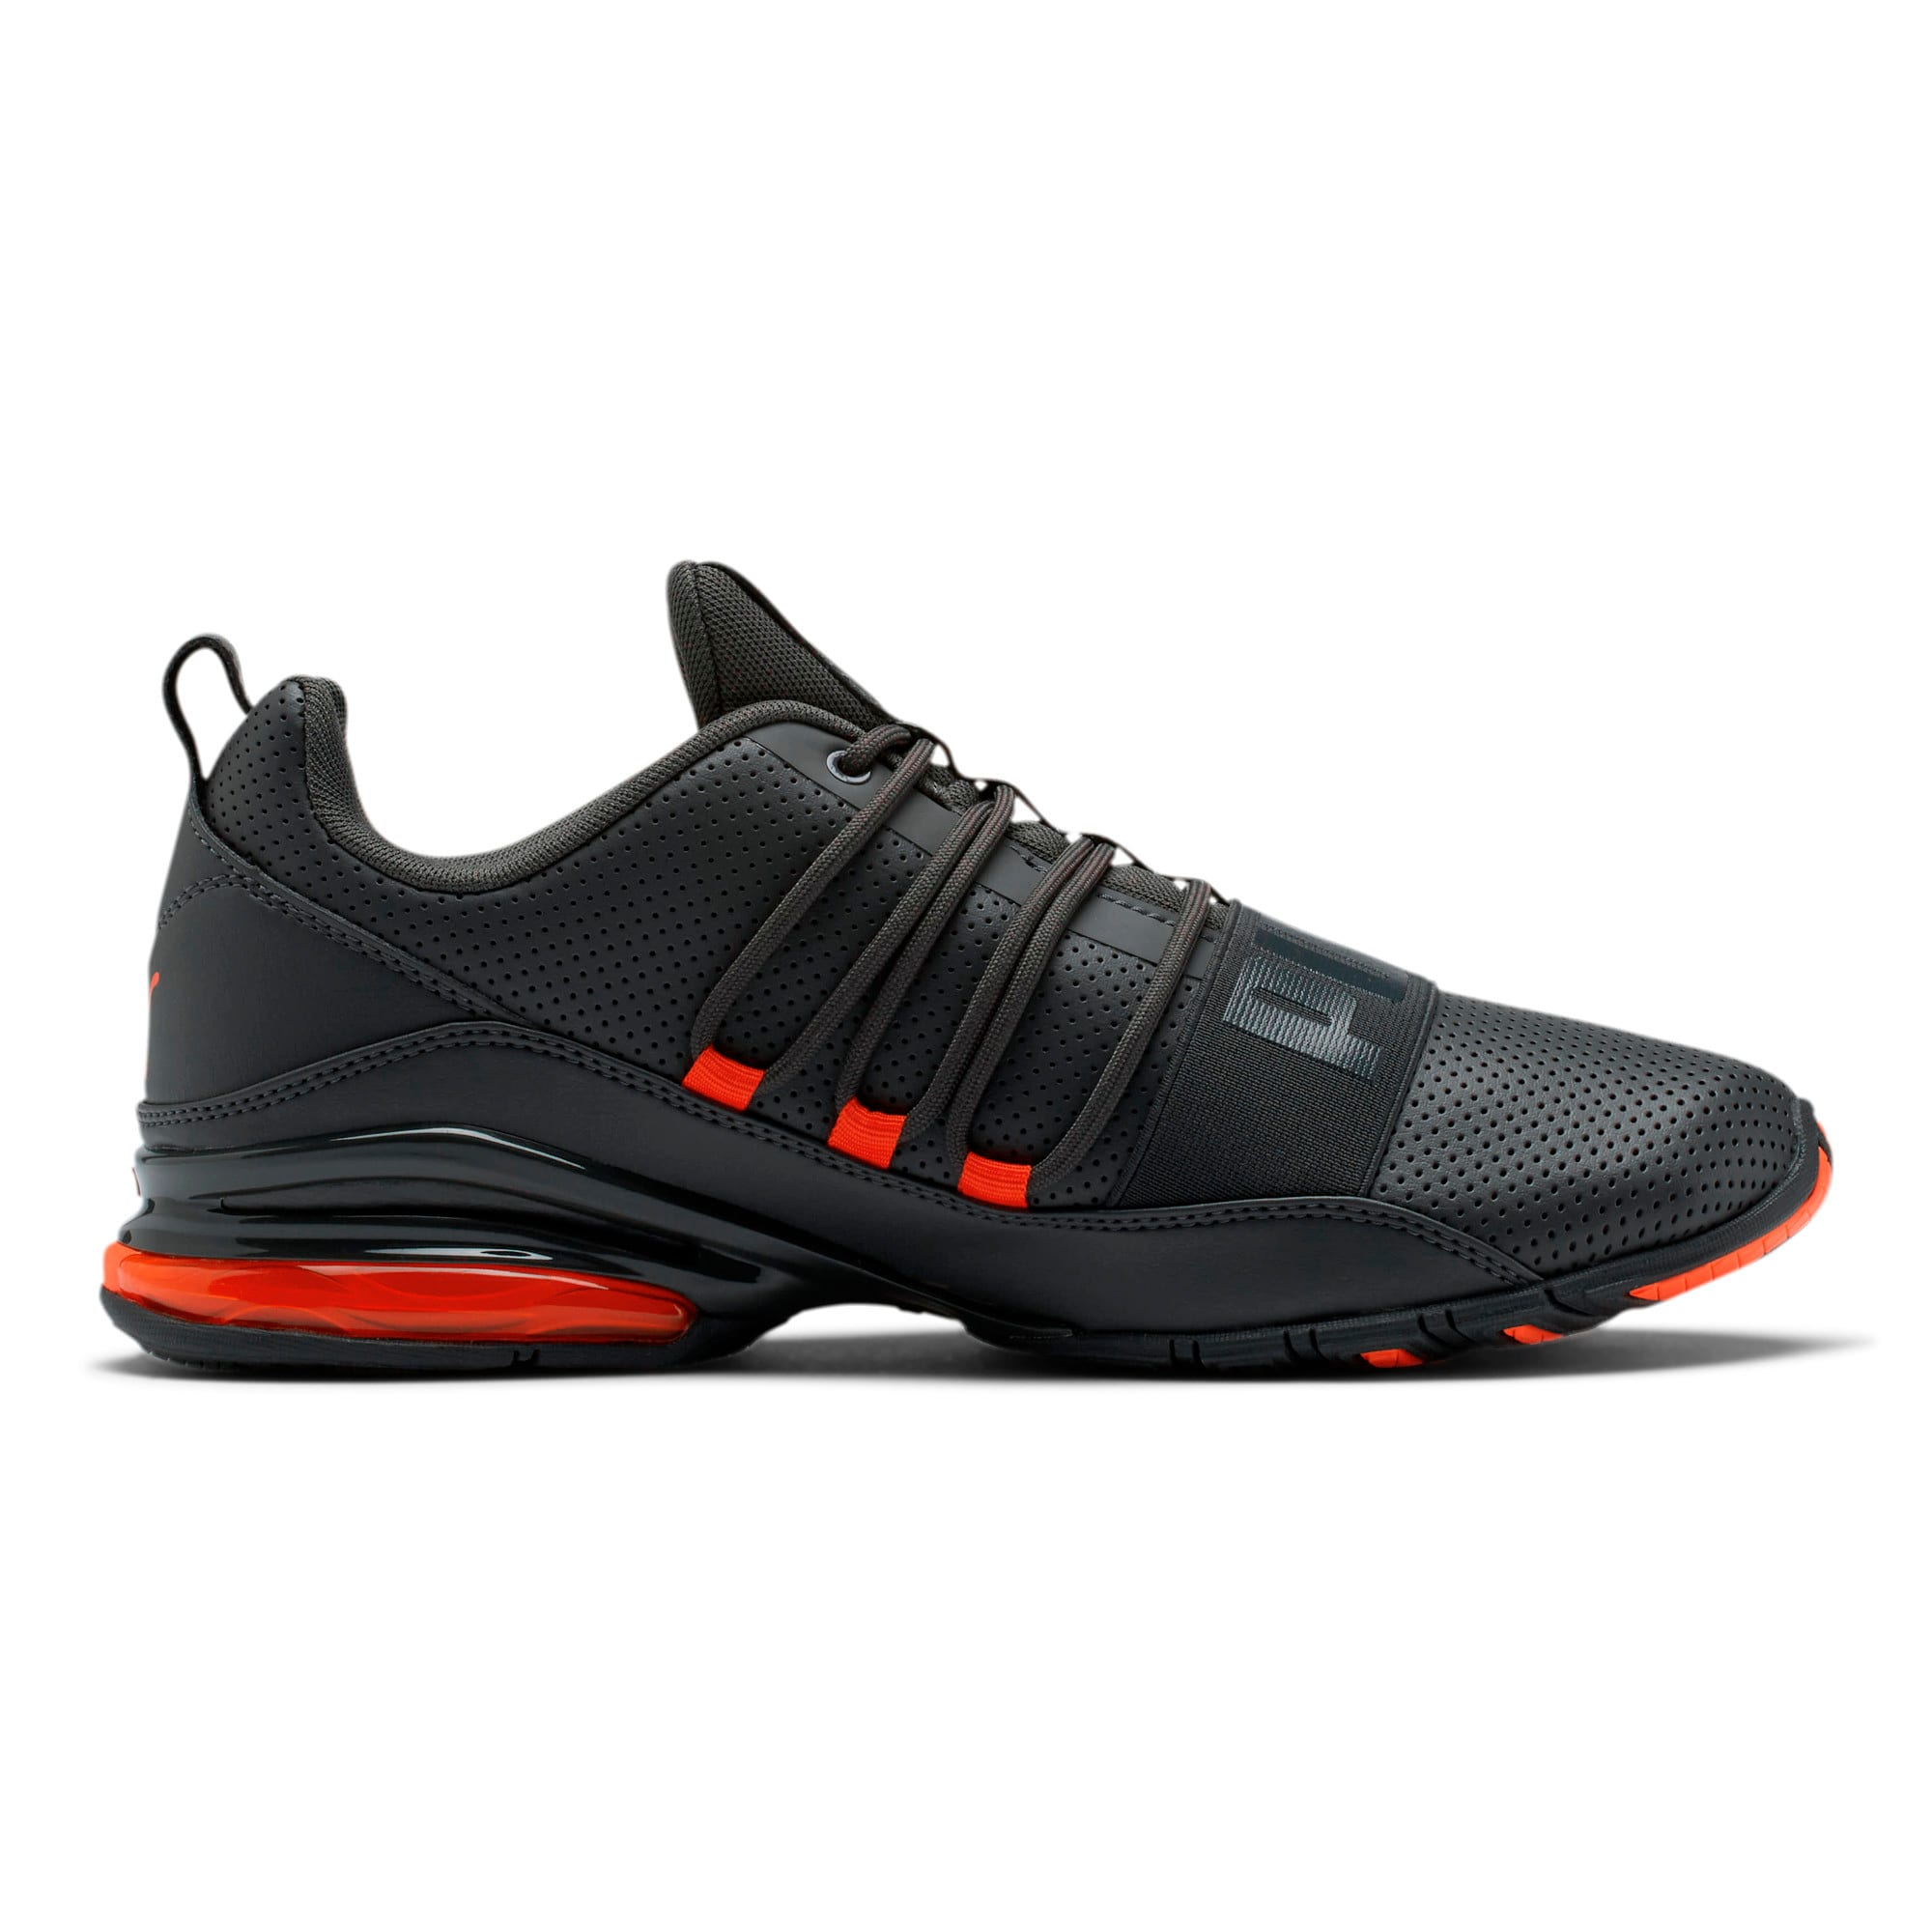 Thumbnail 5 of Cell Regulate Men's Running Shoes, Dark Shadow-Nrgy Red, medium